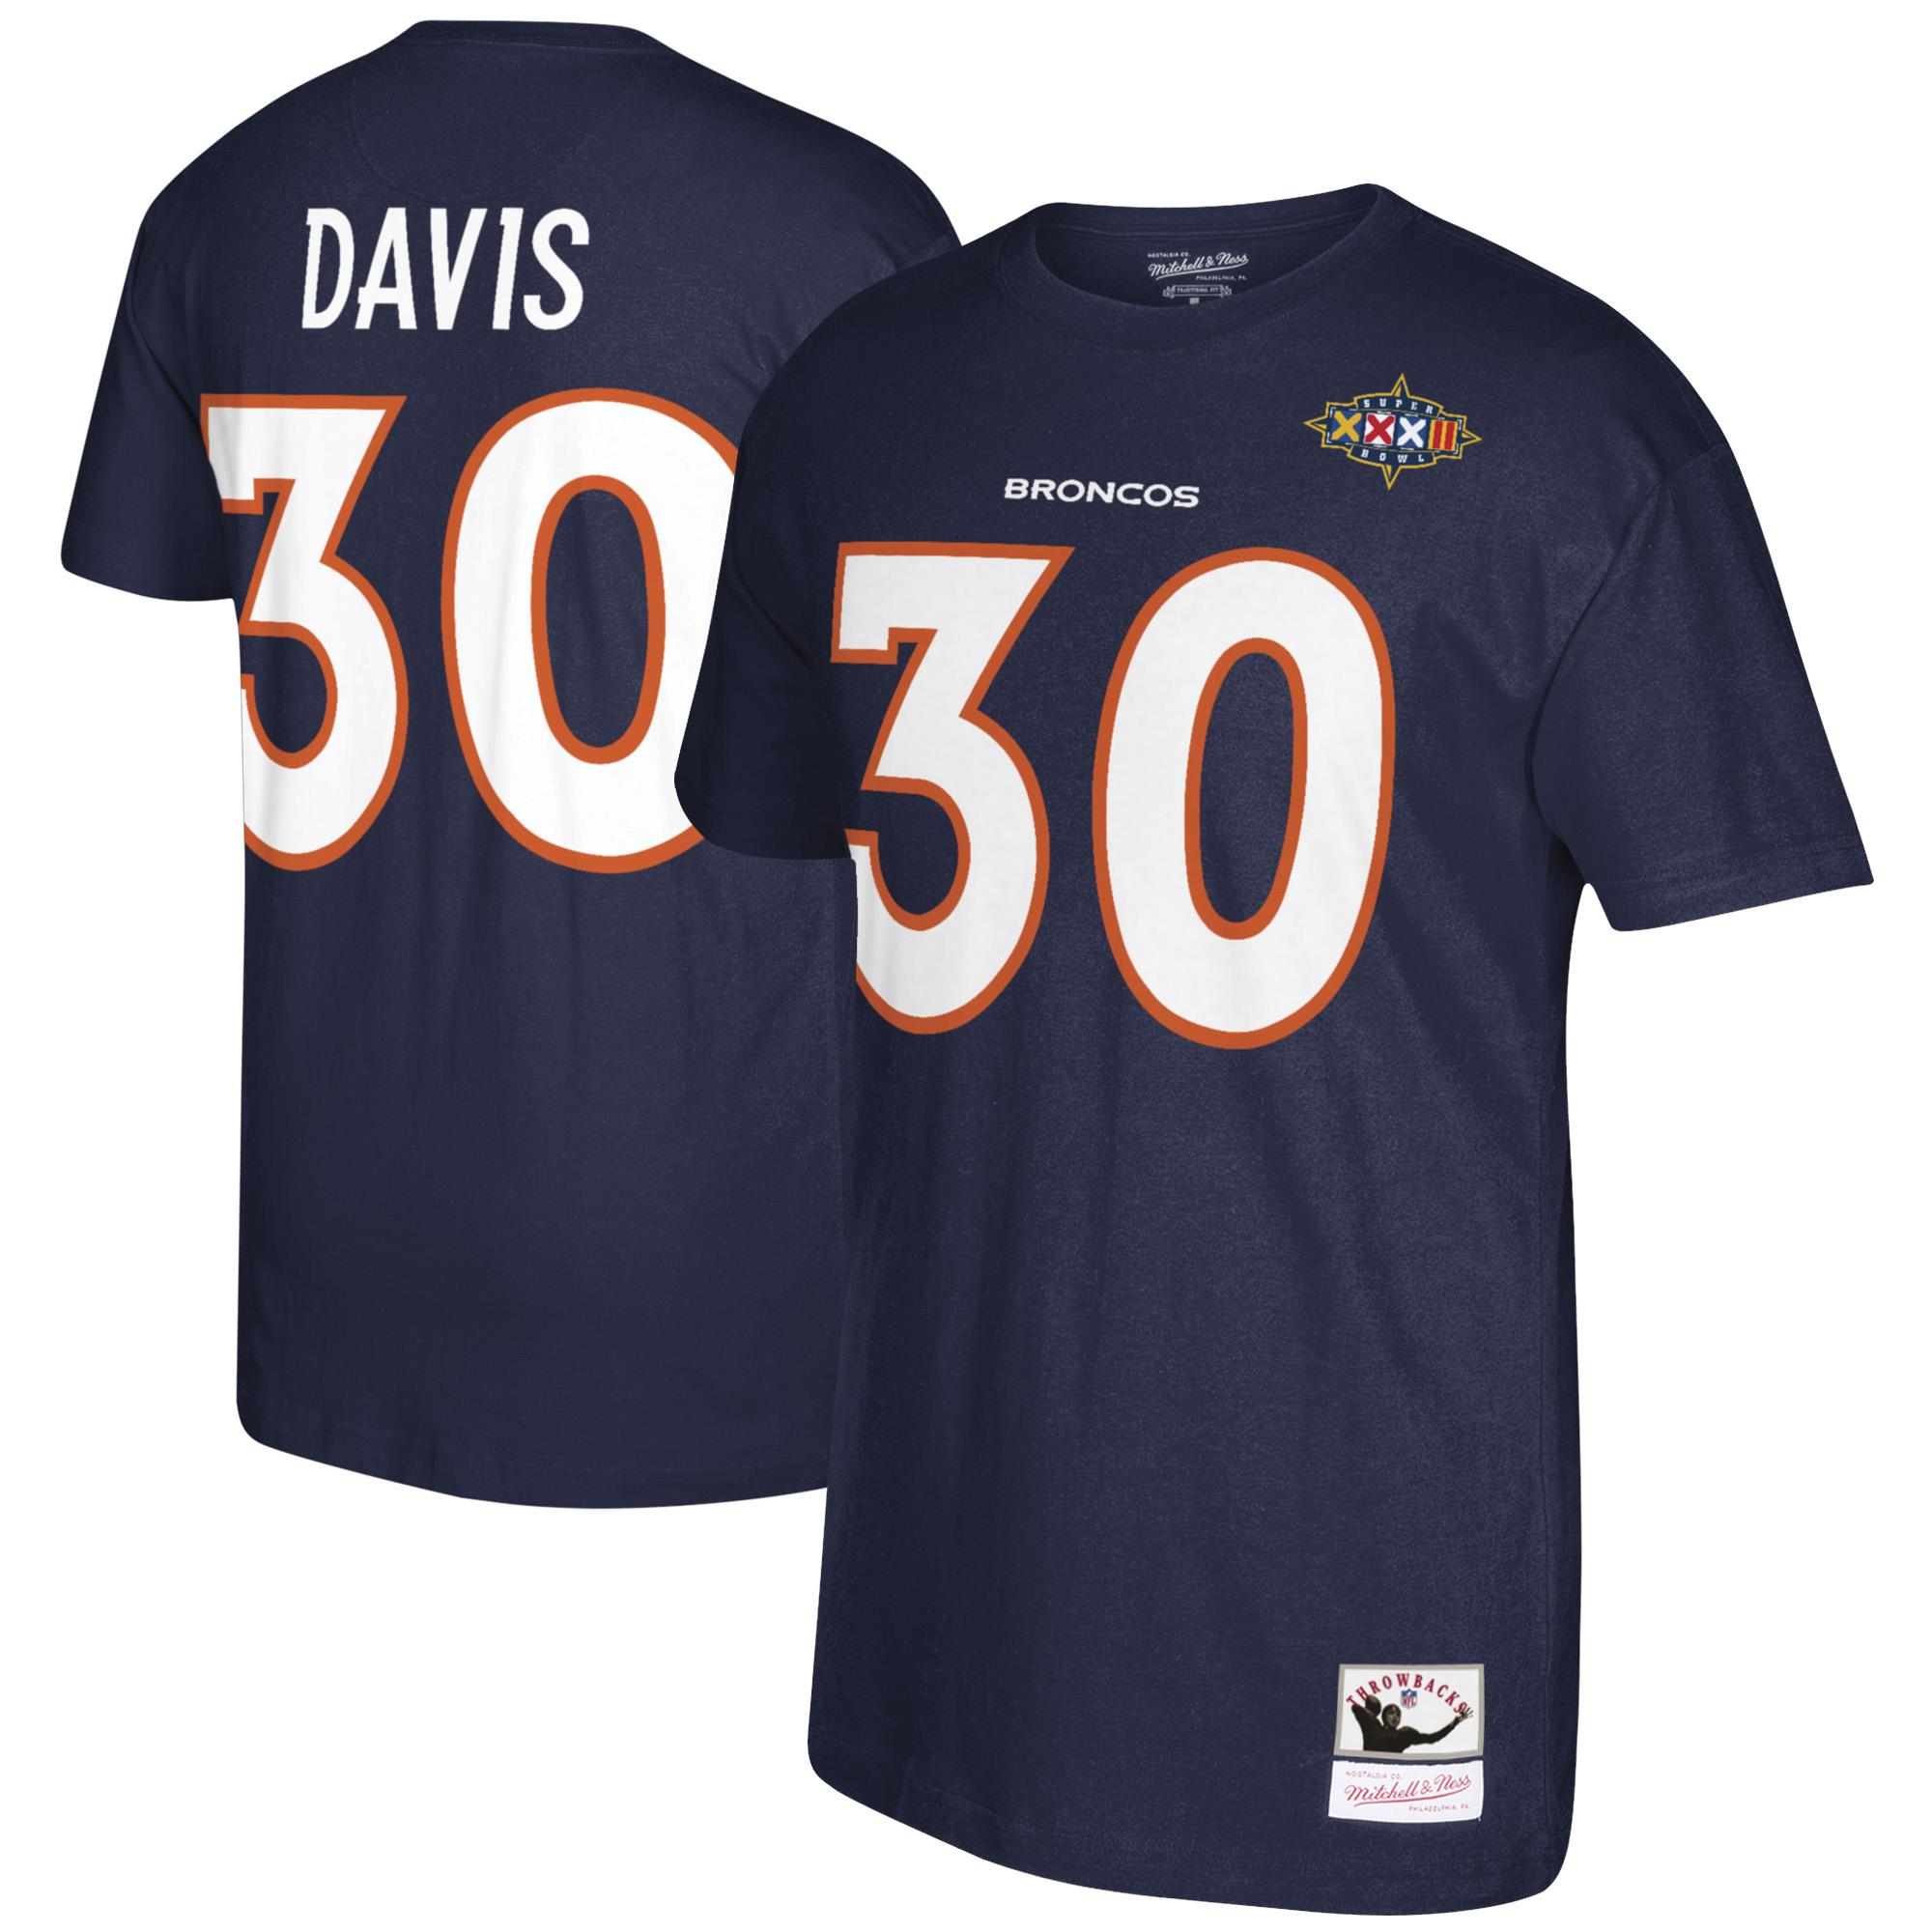 Terrell Davis Denver Broncos Mitchell & Ness Retired Player Name & Number T-Shirt - Navy